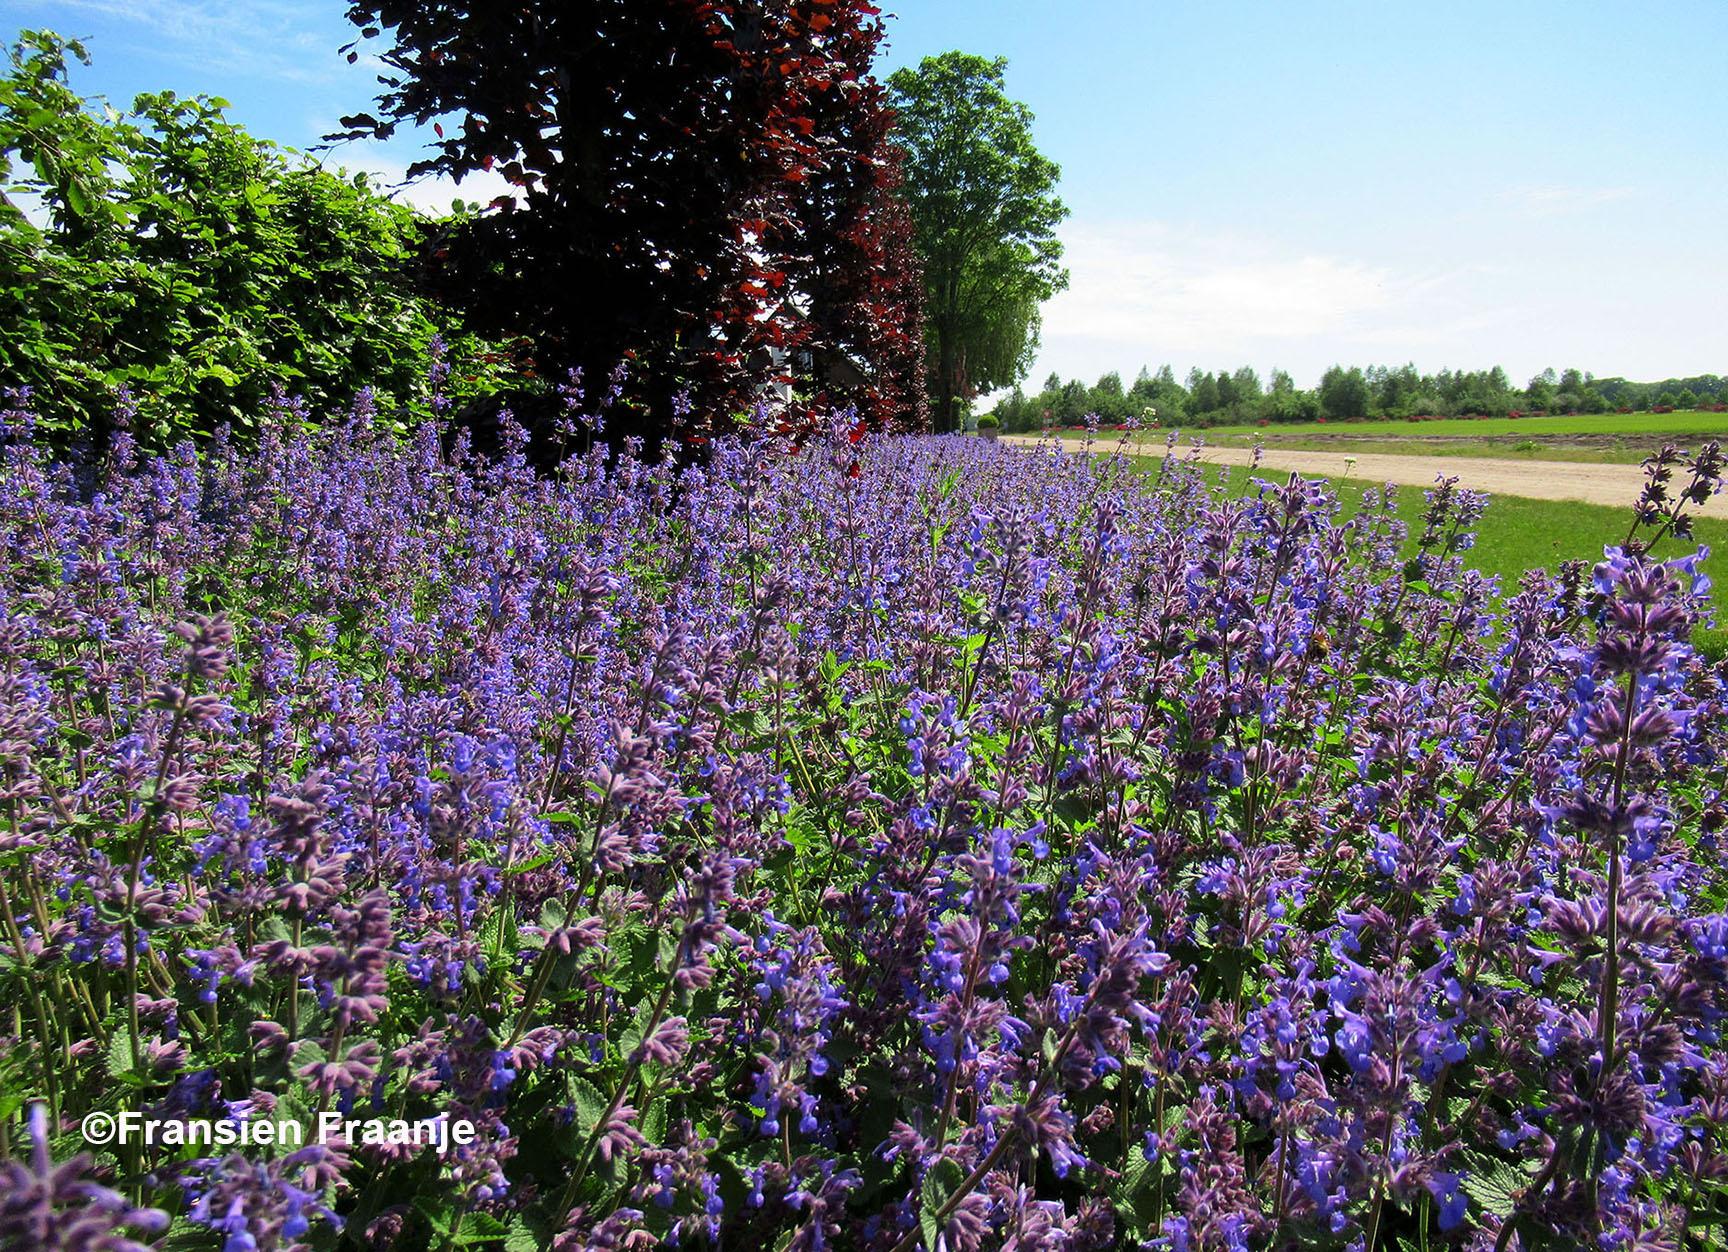 Prachtig lila/paars van Lavendel? Of is het toch een andere soort? - Foto: ©Fransien Fraanje